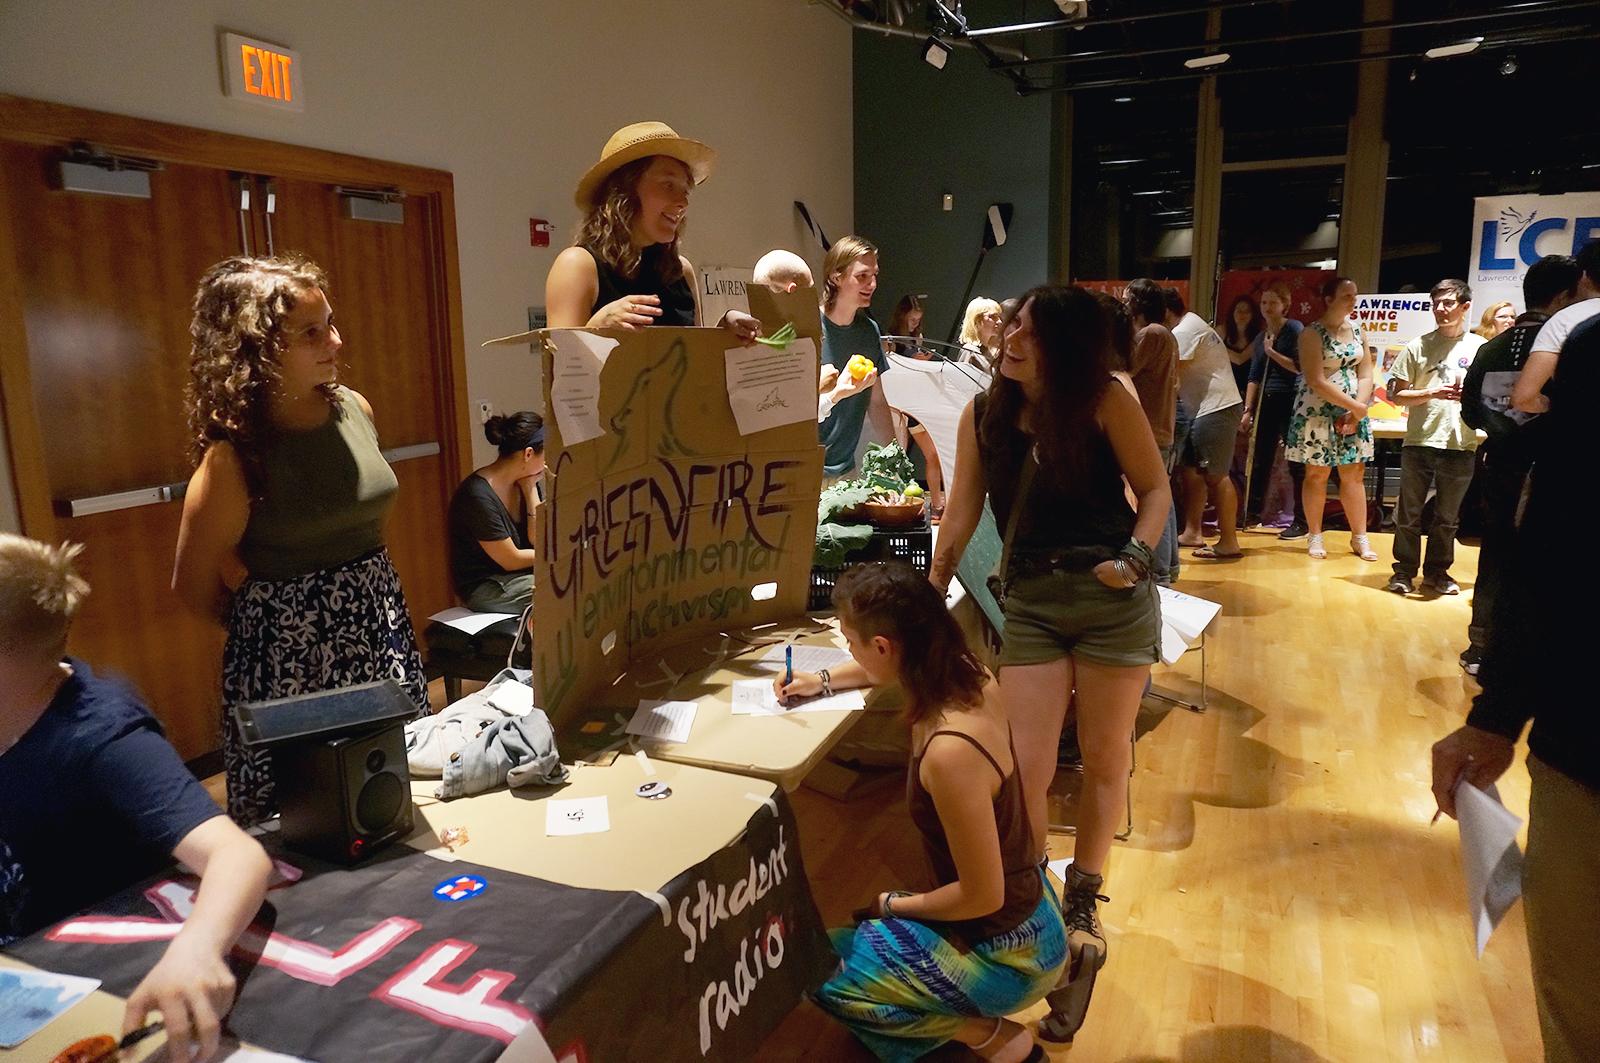 Greenfire members talk to potential new members.